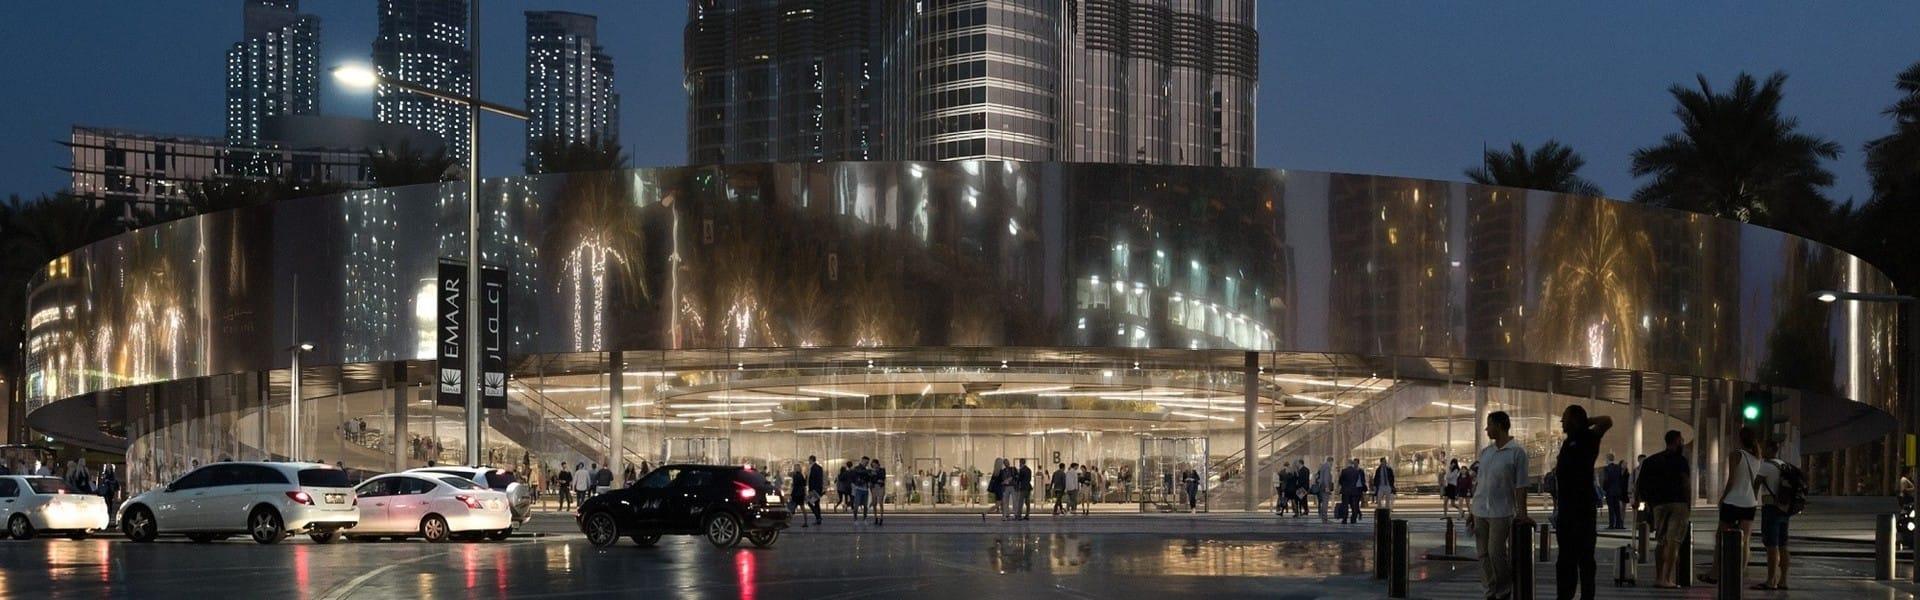 Hyperloop One Dubai Station TMRW